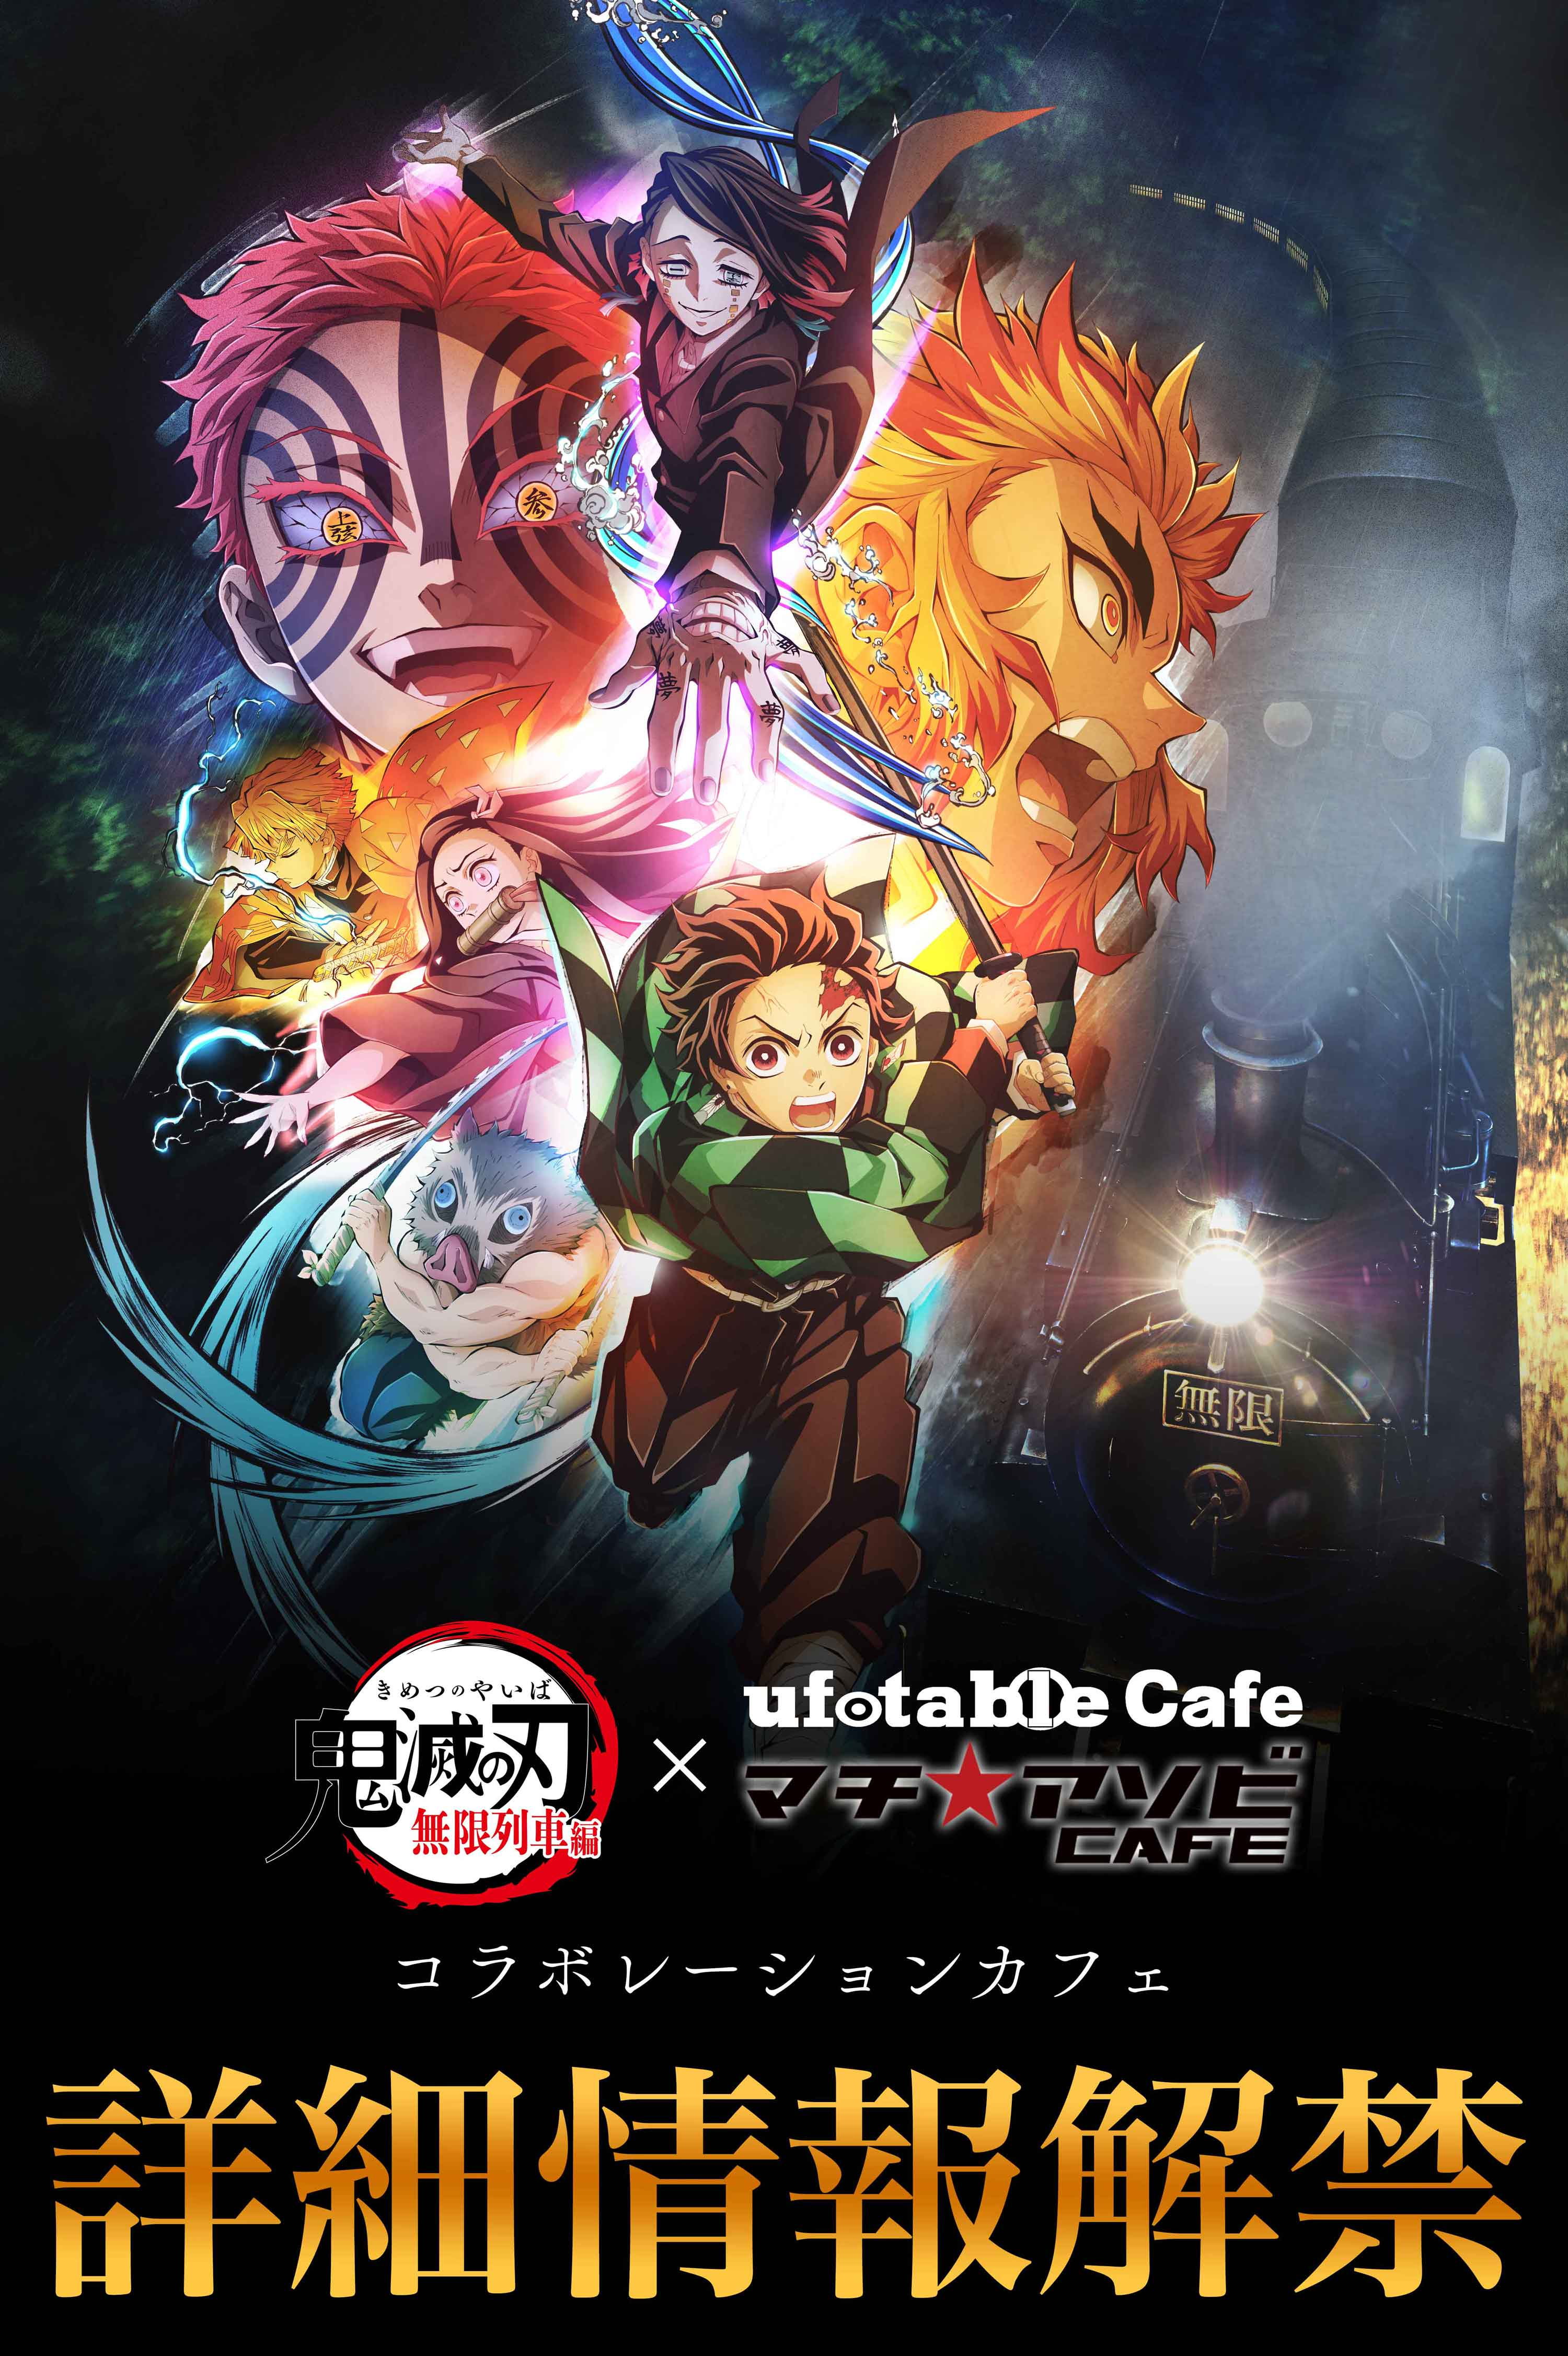 【ufotableCafe or マチ★アソビカフェ東京】テレビアニメ「鬼滅の刃」無限列車編 コラボレーションカフェ